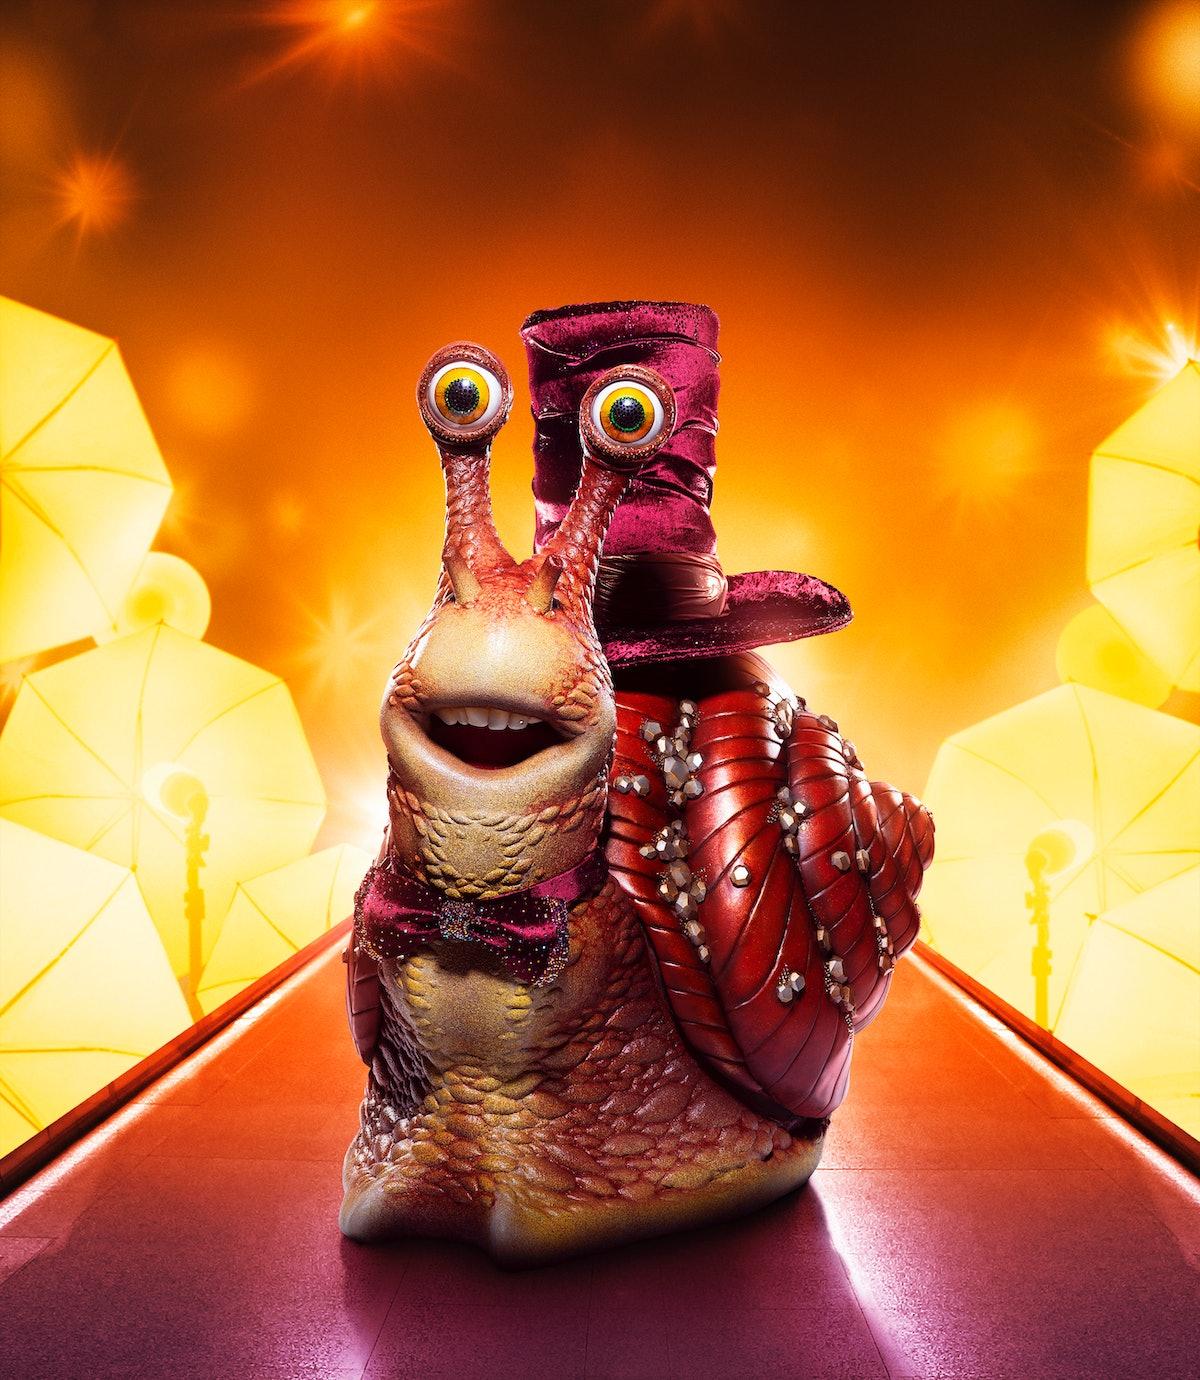 Snail on The Masked Singer